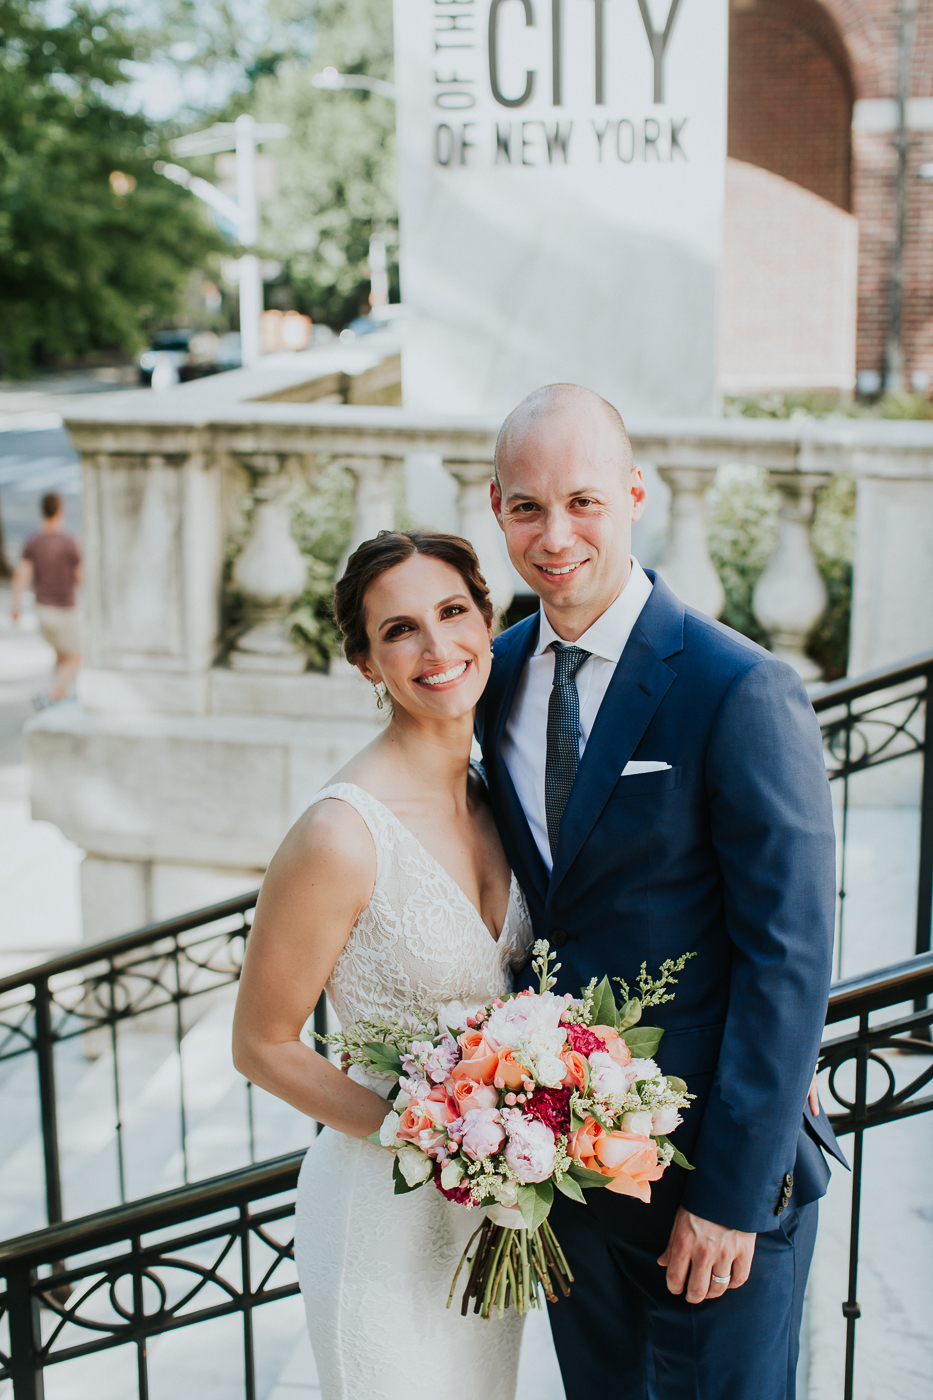 NYC-Central-Park-Conservatory-Garden-Intimate-Elopement-Documentary-Wedding-Photographer-48.jpg